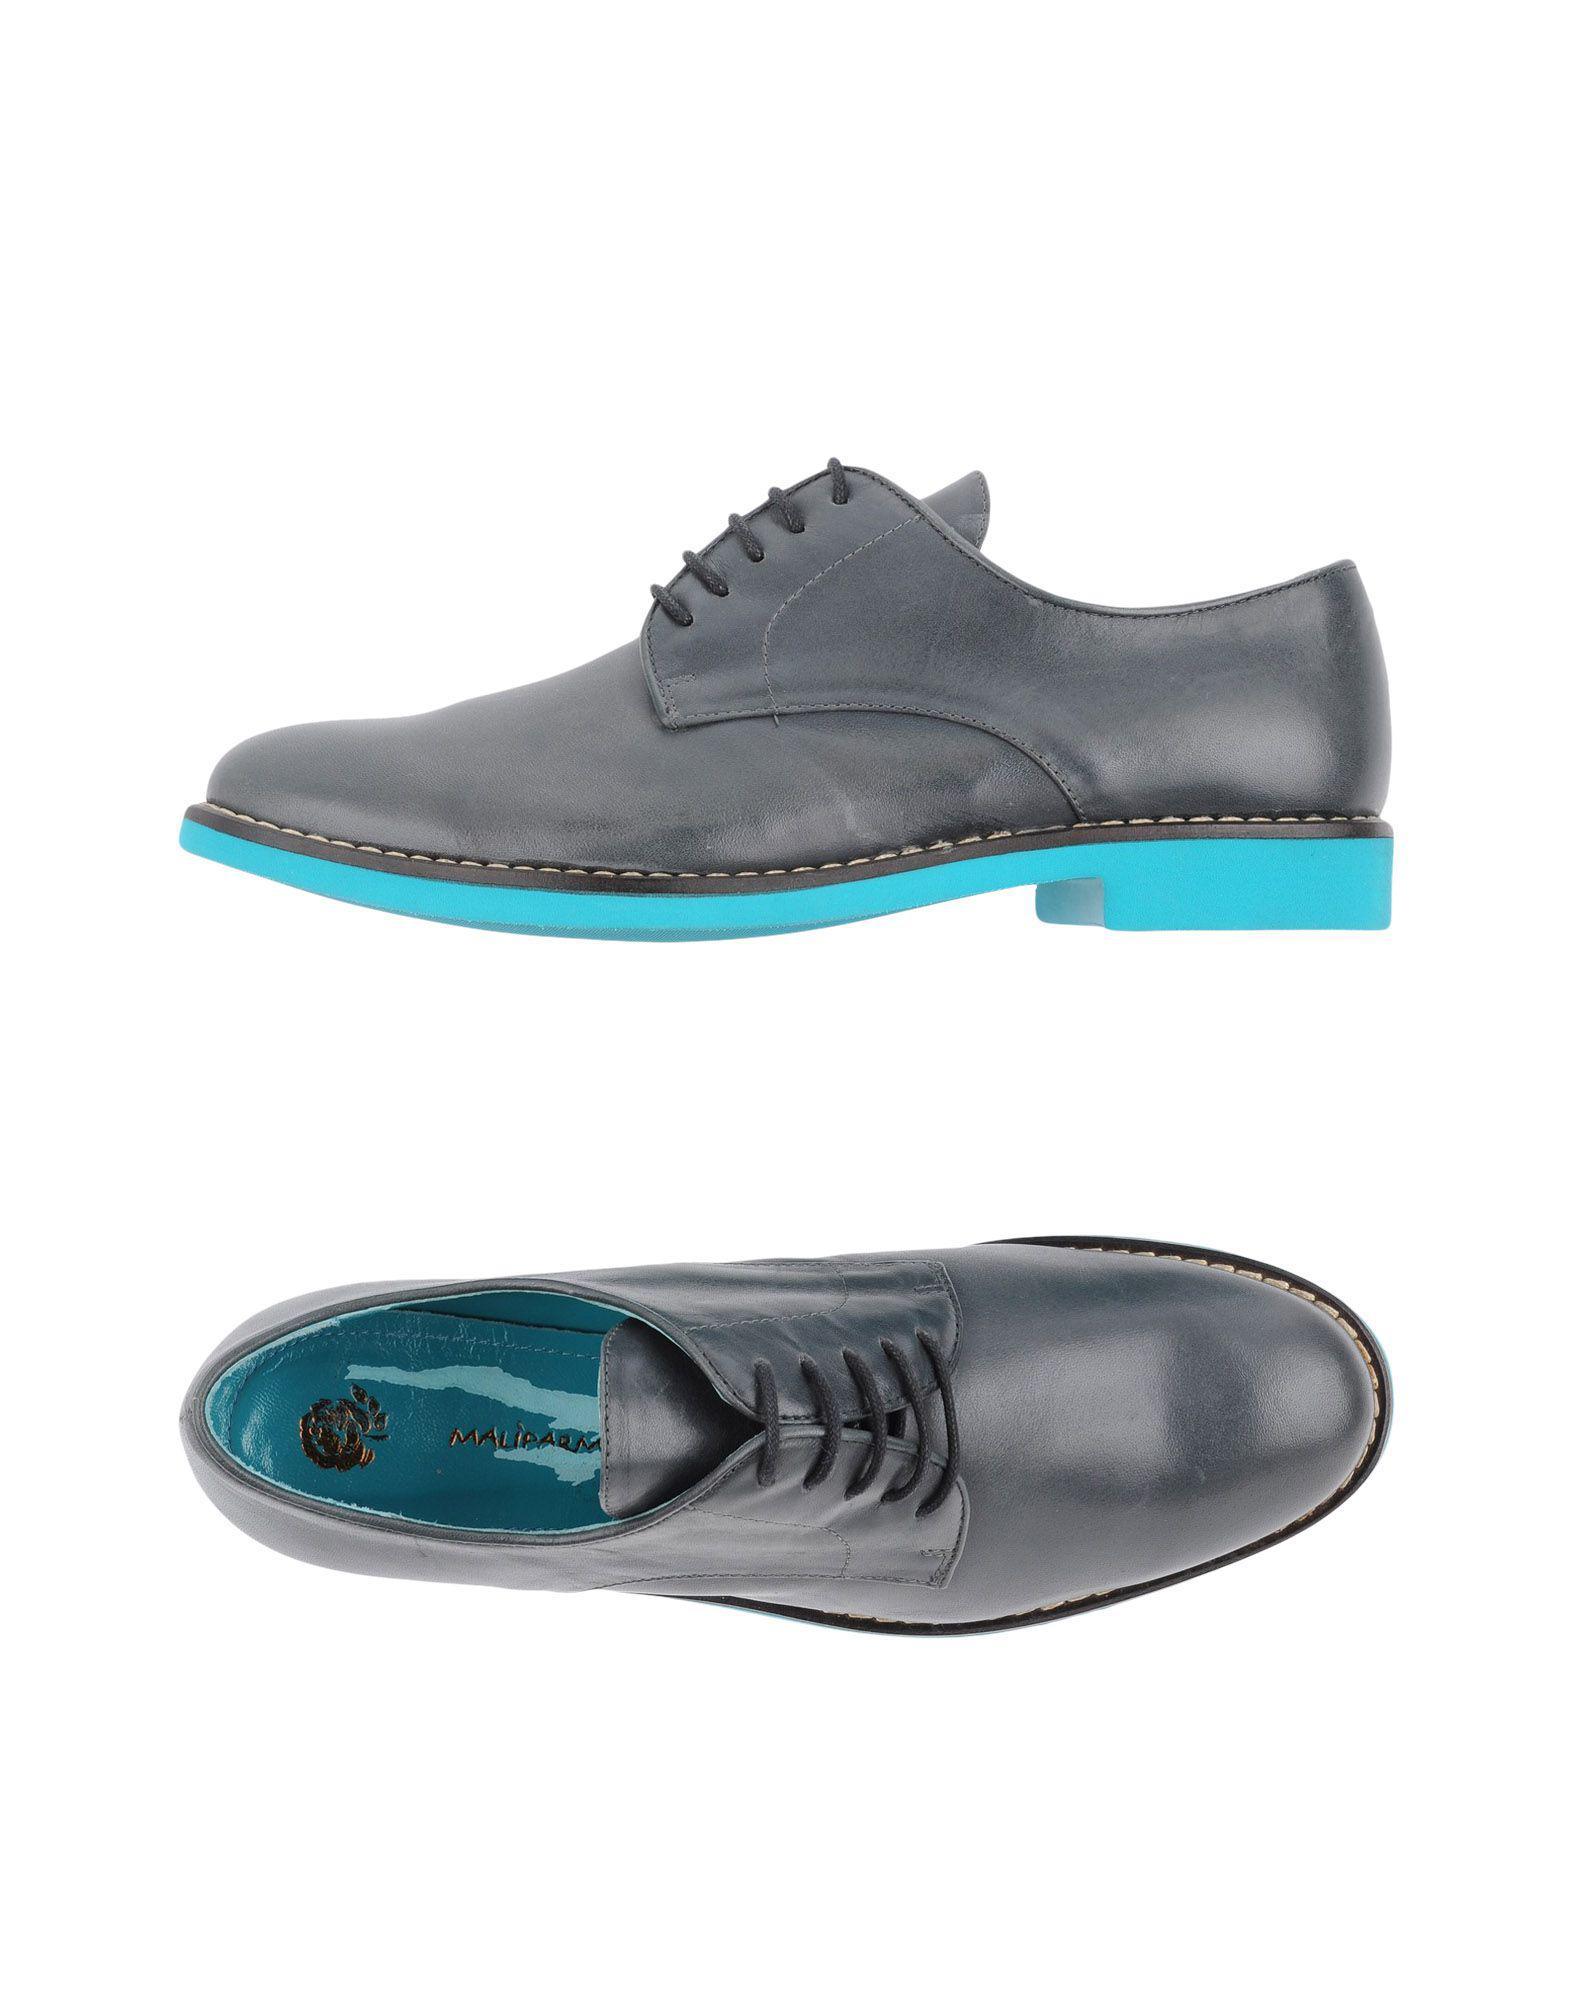 FOOTWEAR - Lace-up shoes Maliparmi Buy Sale Online Buy Cheap Get To Buy 100% Guaranteed N1G7KR1Ml